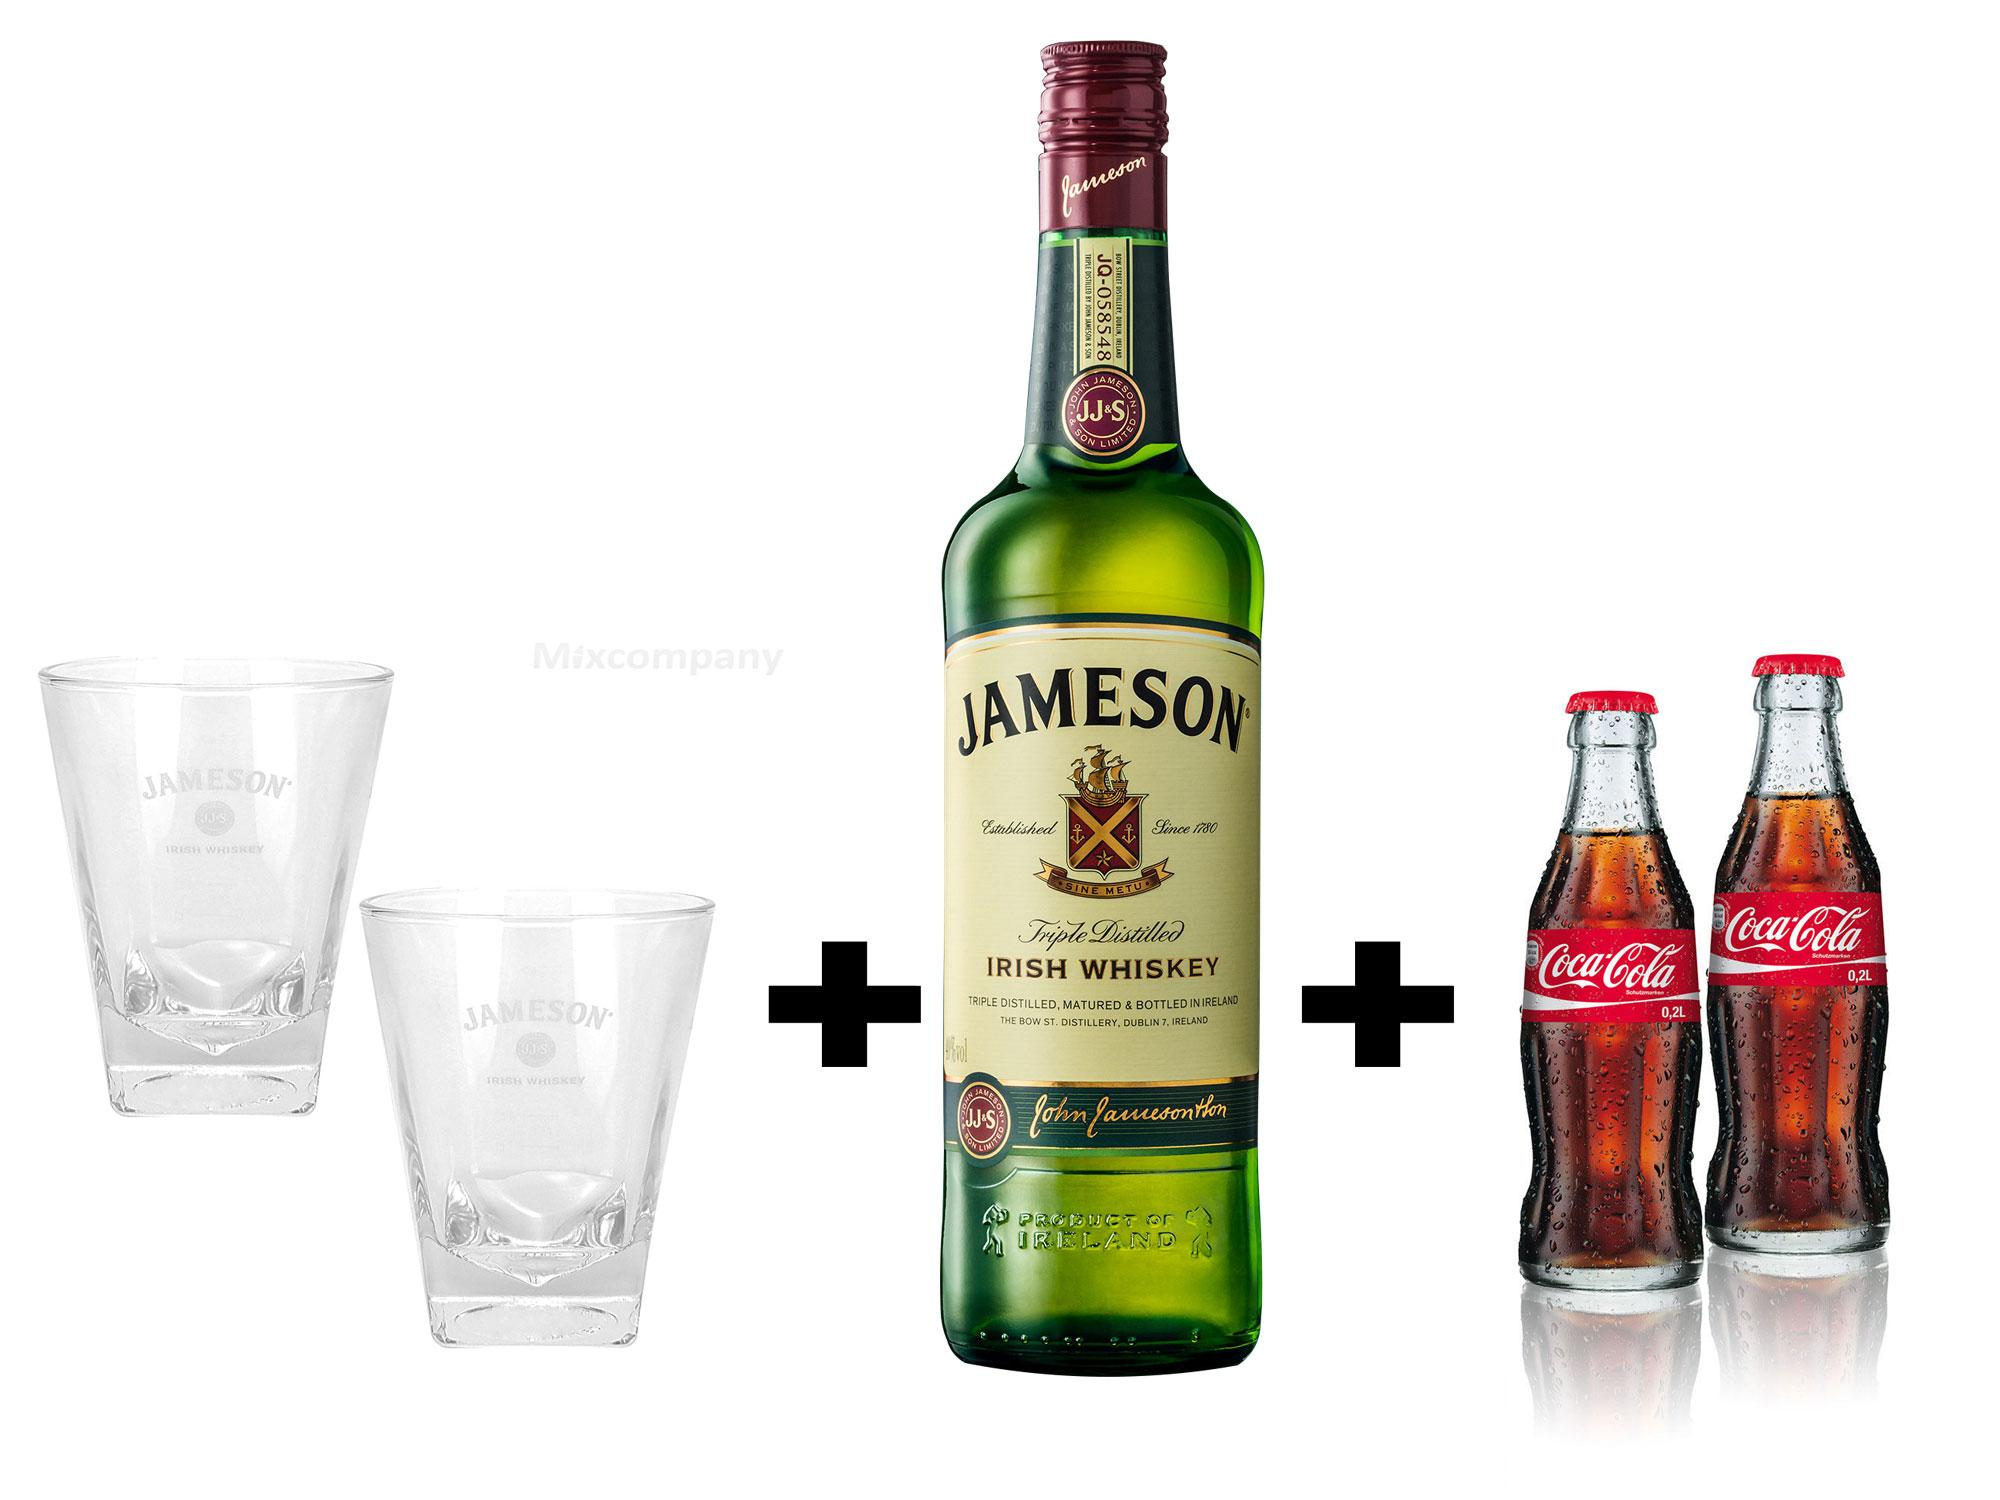 Jameson Irish Whiskey 1,0l (40% Vol) + 2x Tumbler + 2 x Coca Cola 0,2l MEHRWEG inkl. Pfand Whisky- [Enthält Sulfite]